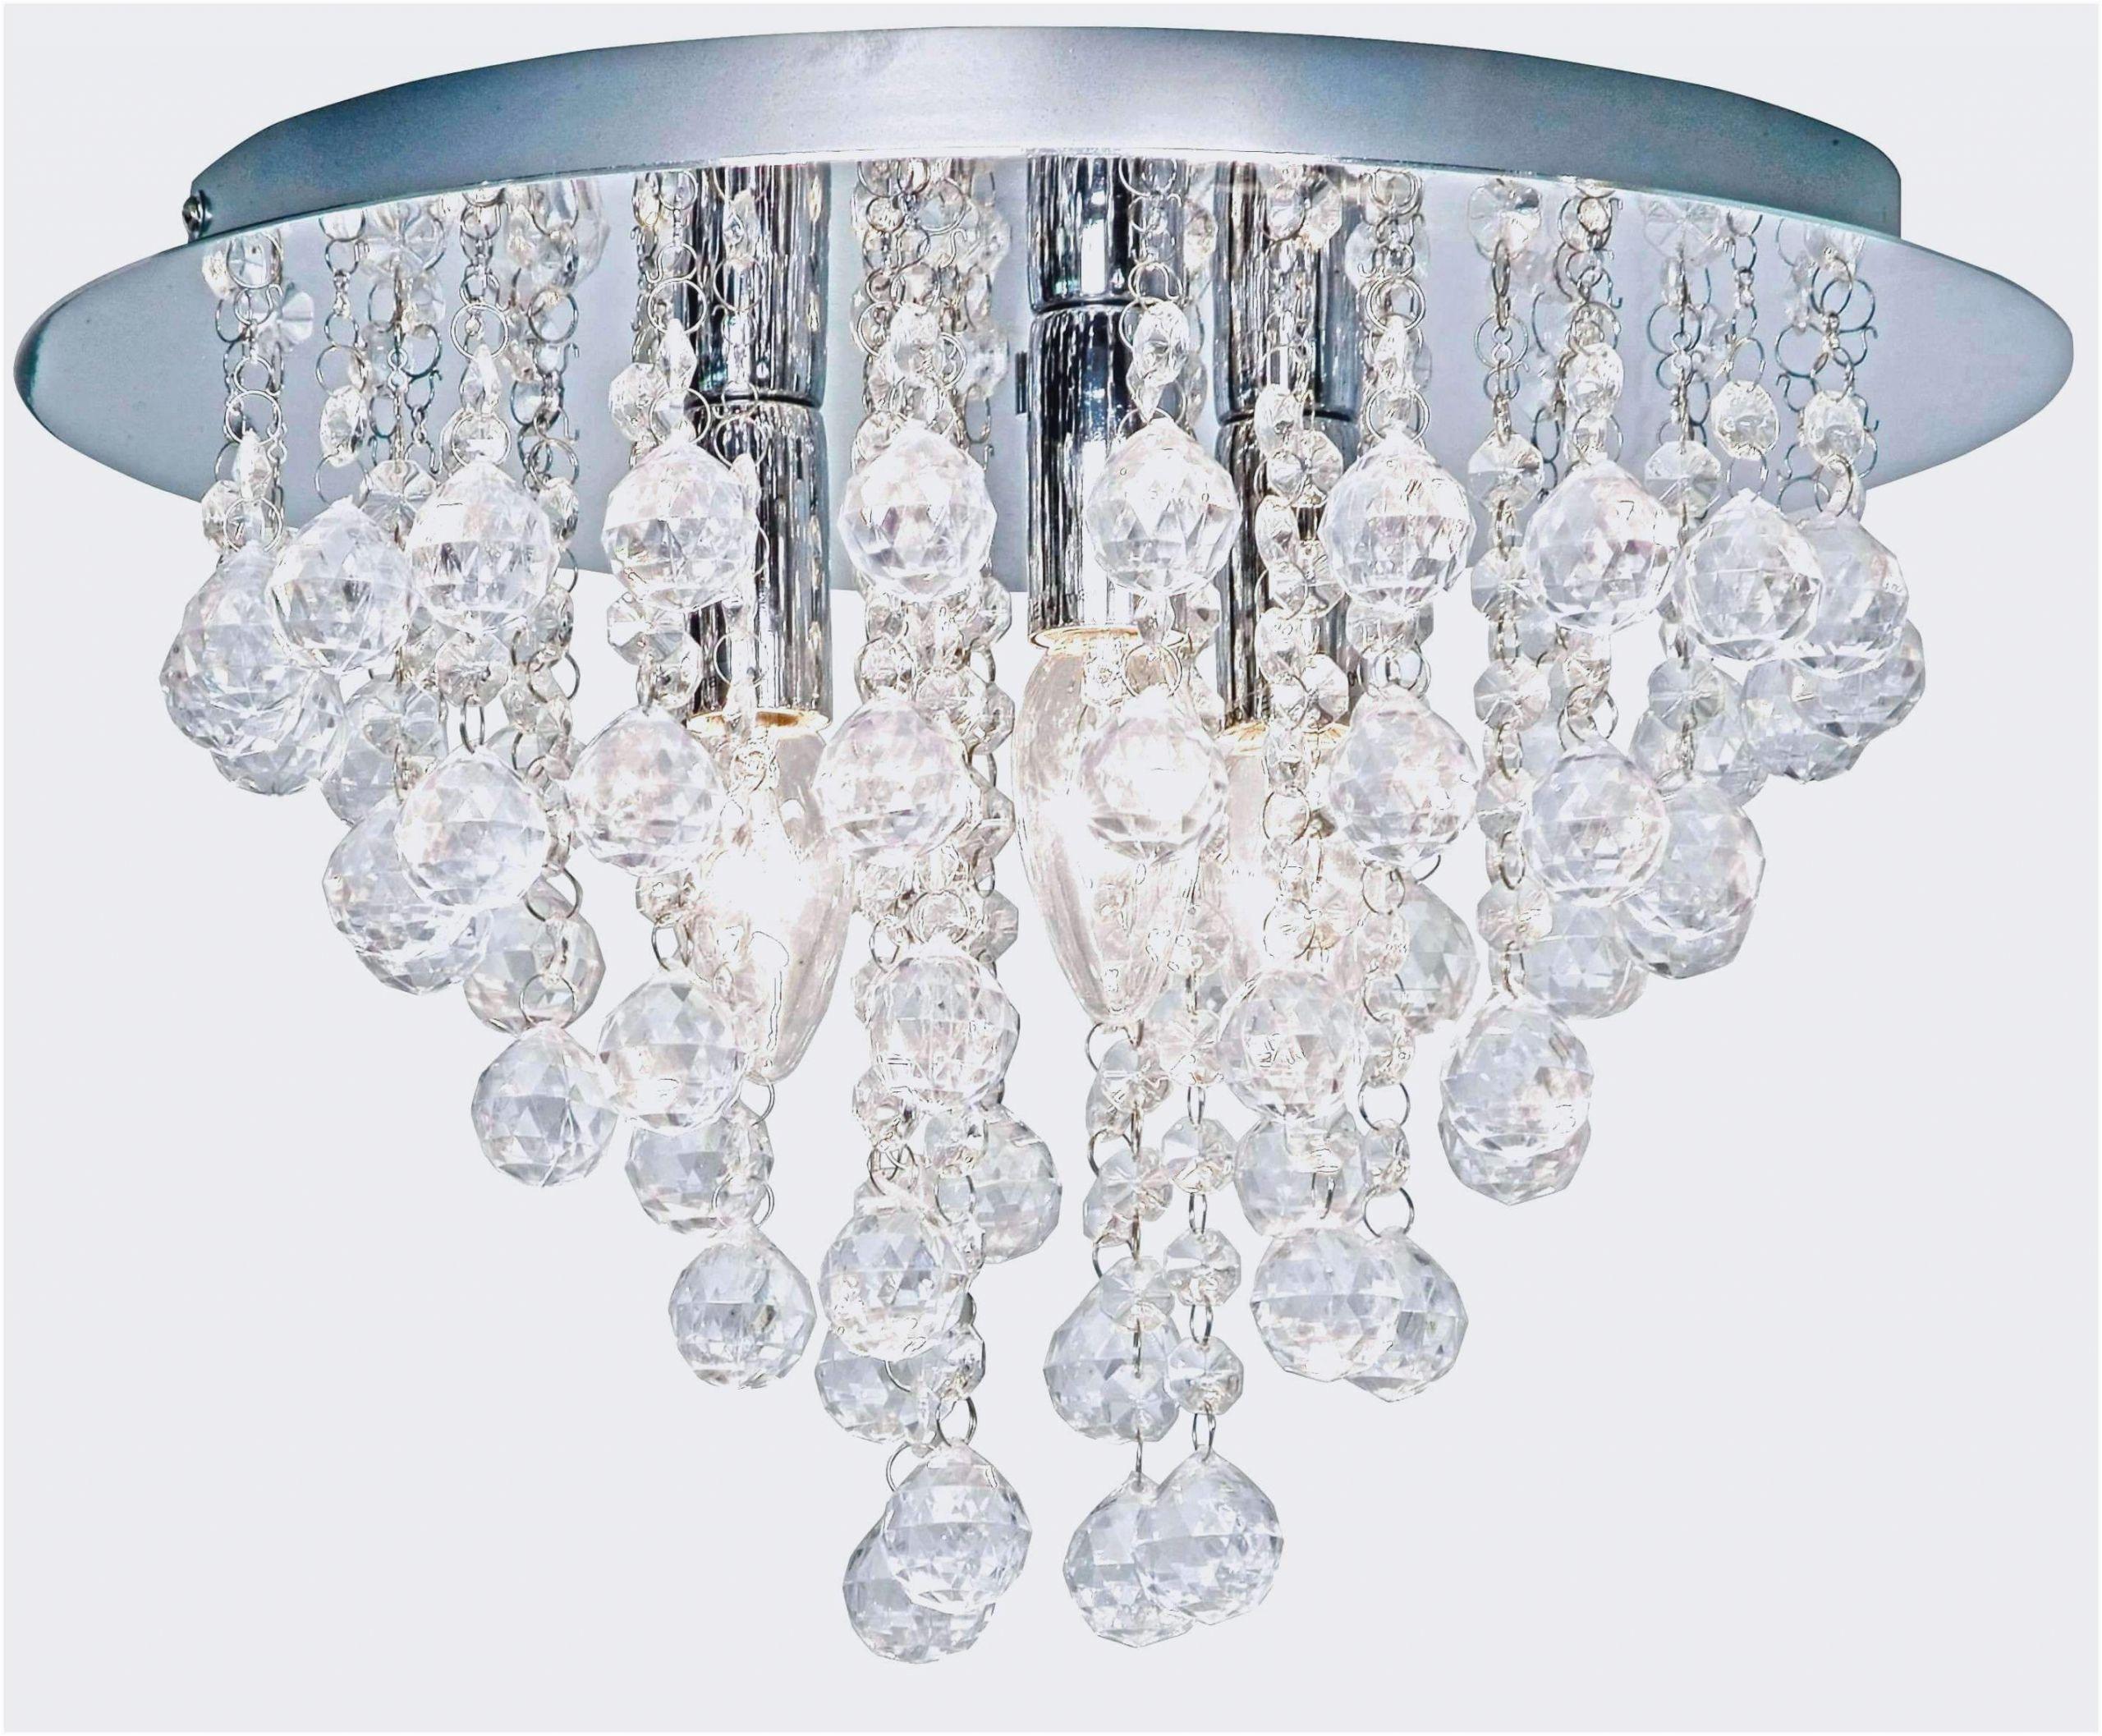 Badezimmer Lampen Ikea Ikea Lampen Wohnzimmer Luxus Luxe Led Lampe Badezimmer